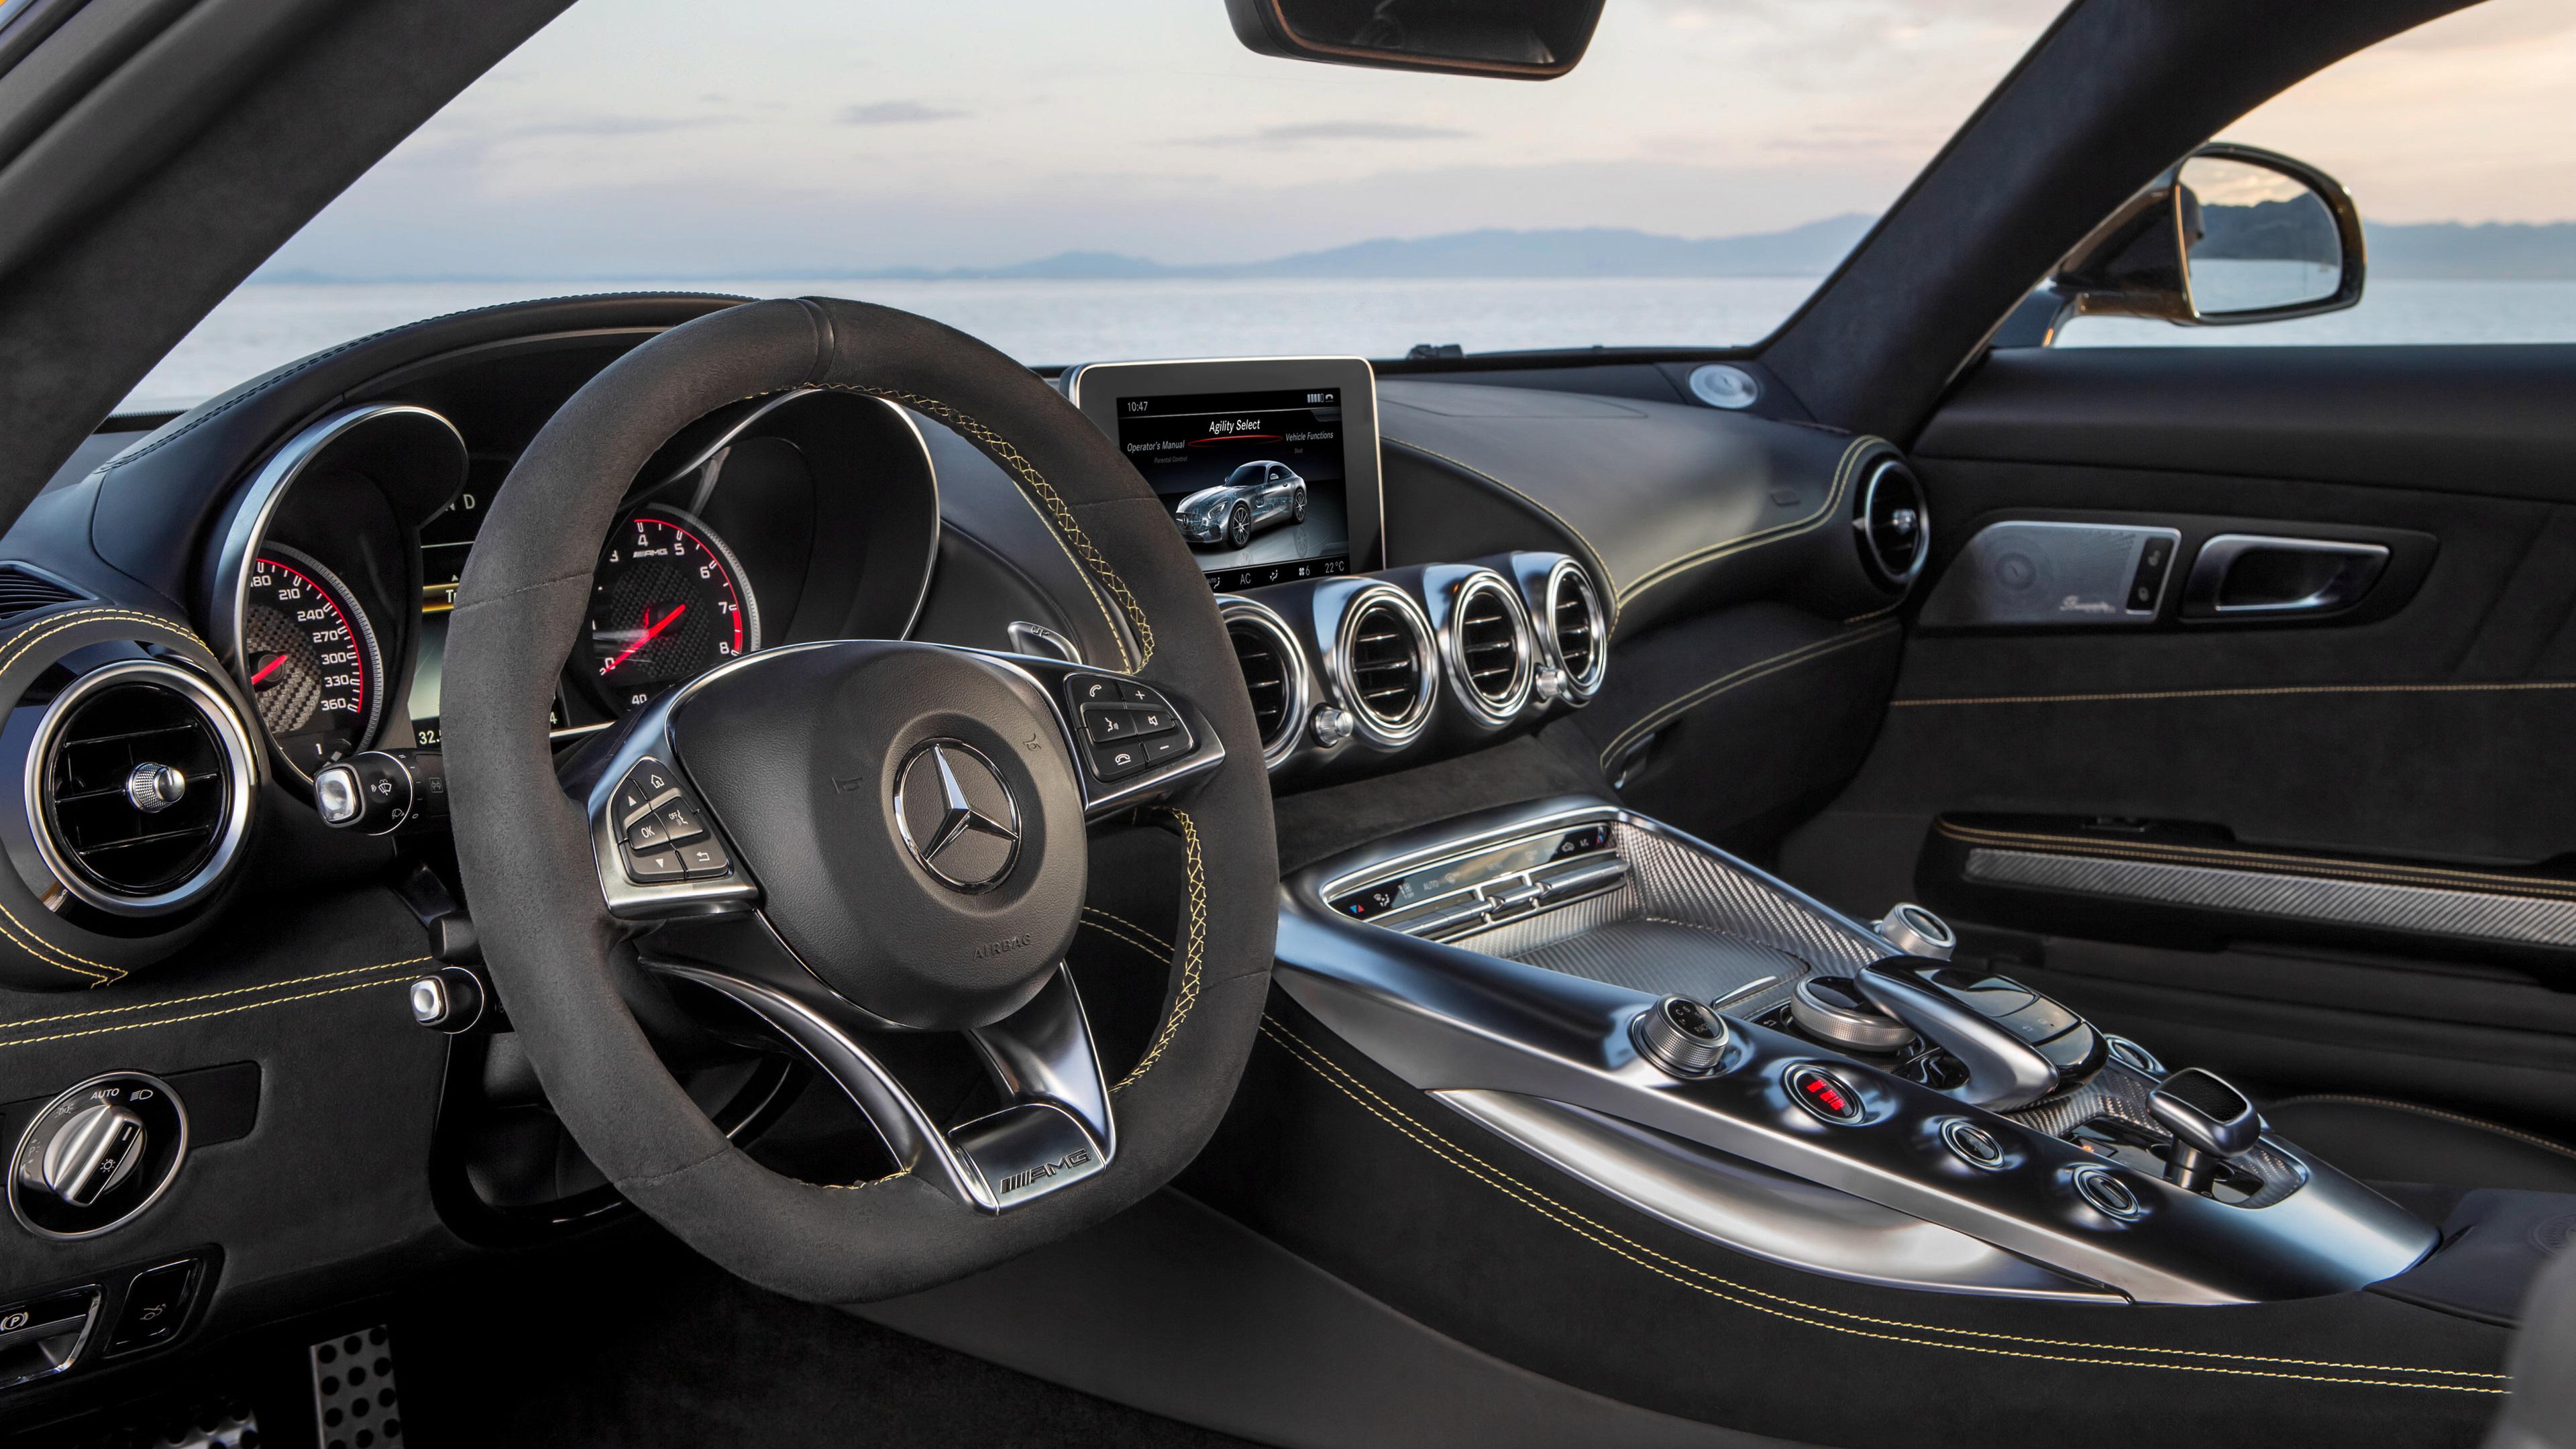 mercedes amg gt s 2017 interior 1539108916 - Mercedes AMG GT S 2017 Interior - mercedes wallpapers, mercedes amg wallpapers, interior wallpapers, hd-wallpapers, cars wallpapers, 4k-wallpapers, 2017 cars wallpapers